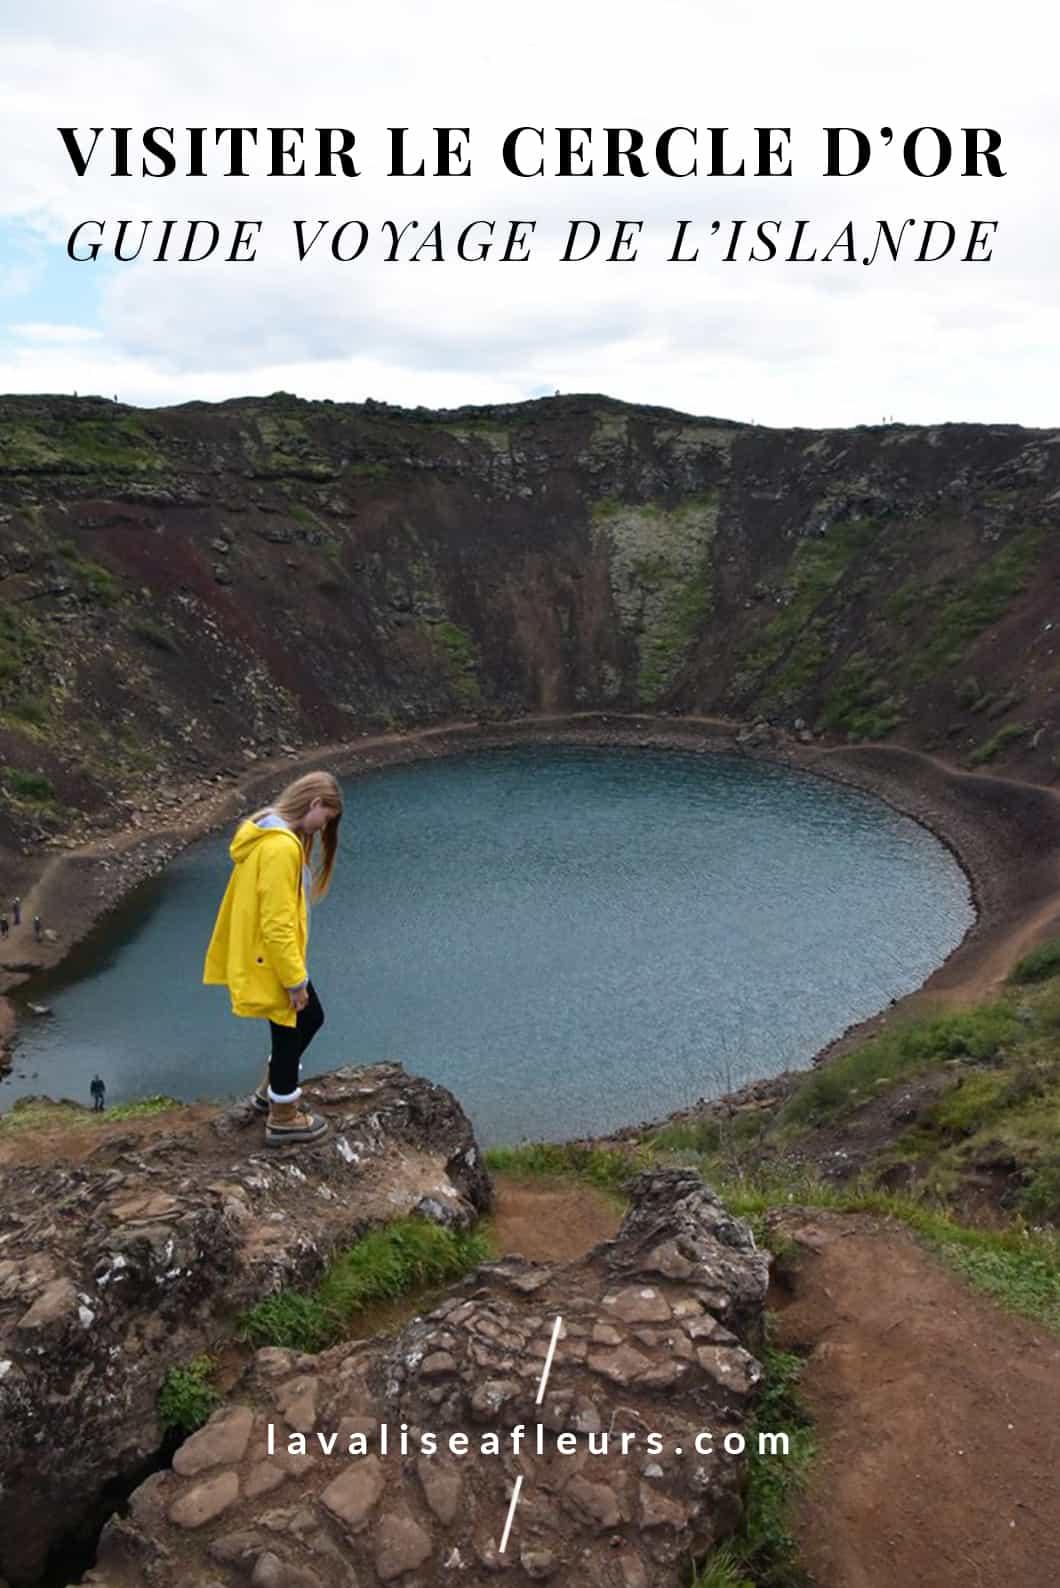 Visite du Cercle d'or, guide de voyage en Islande